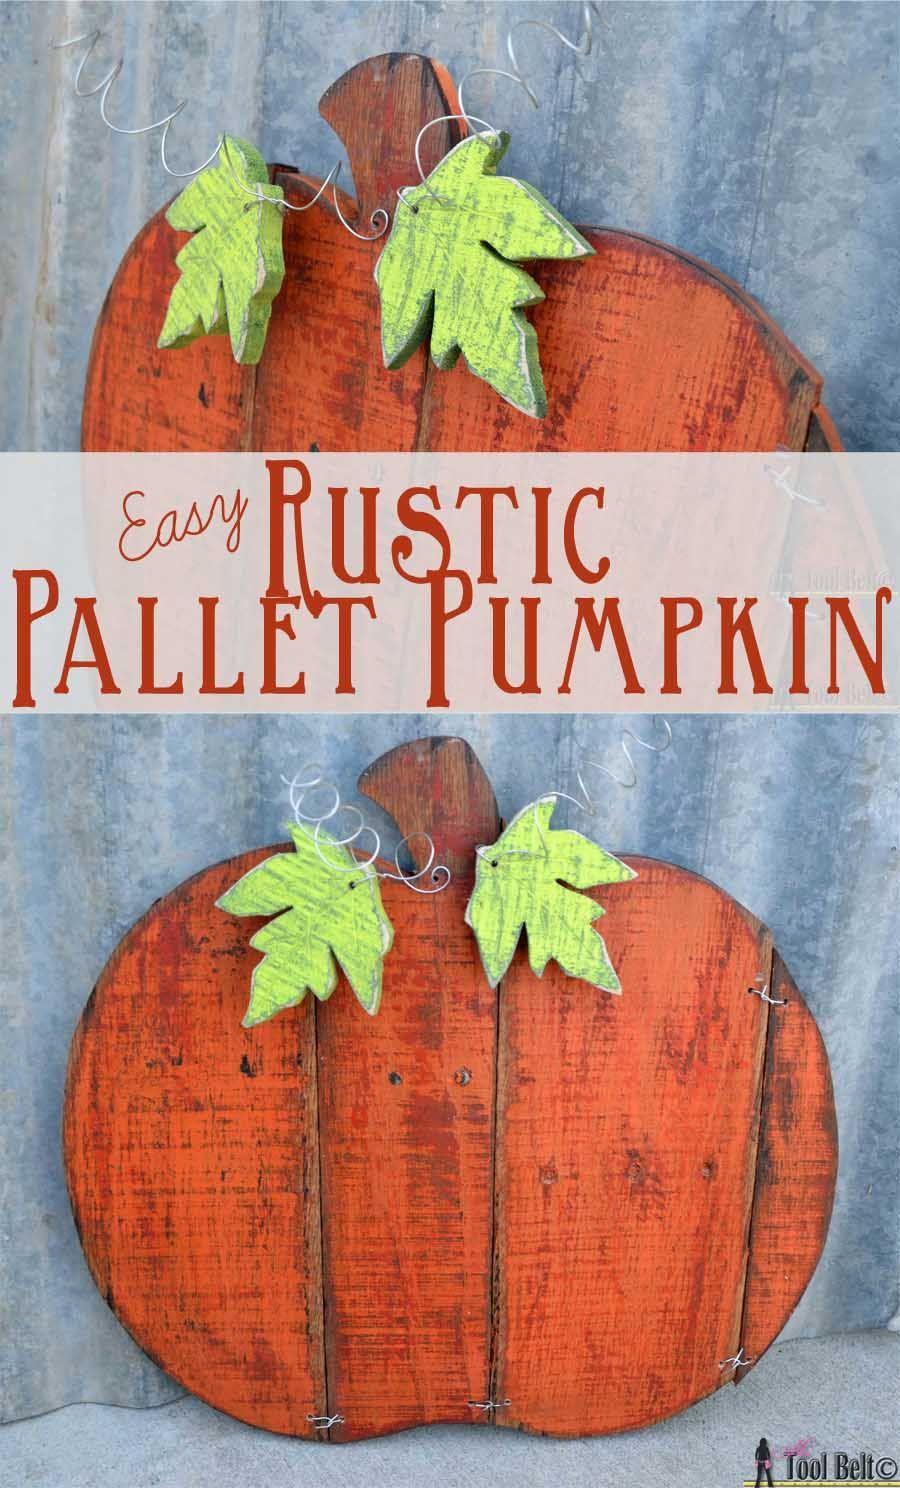 Rustic Pallet Pumpkin | Pinterest | Rustoleum spray paint, Wood ...